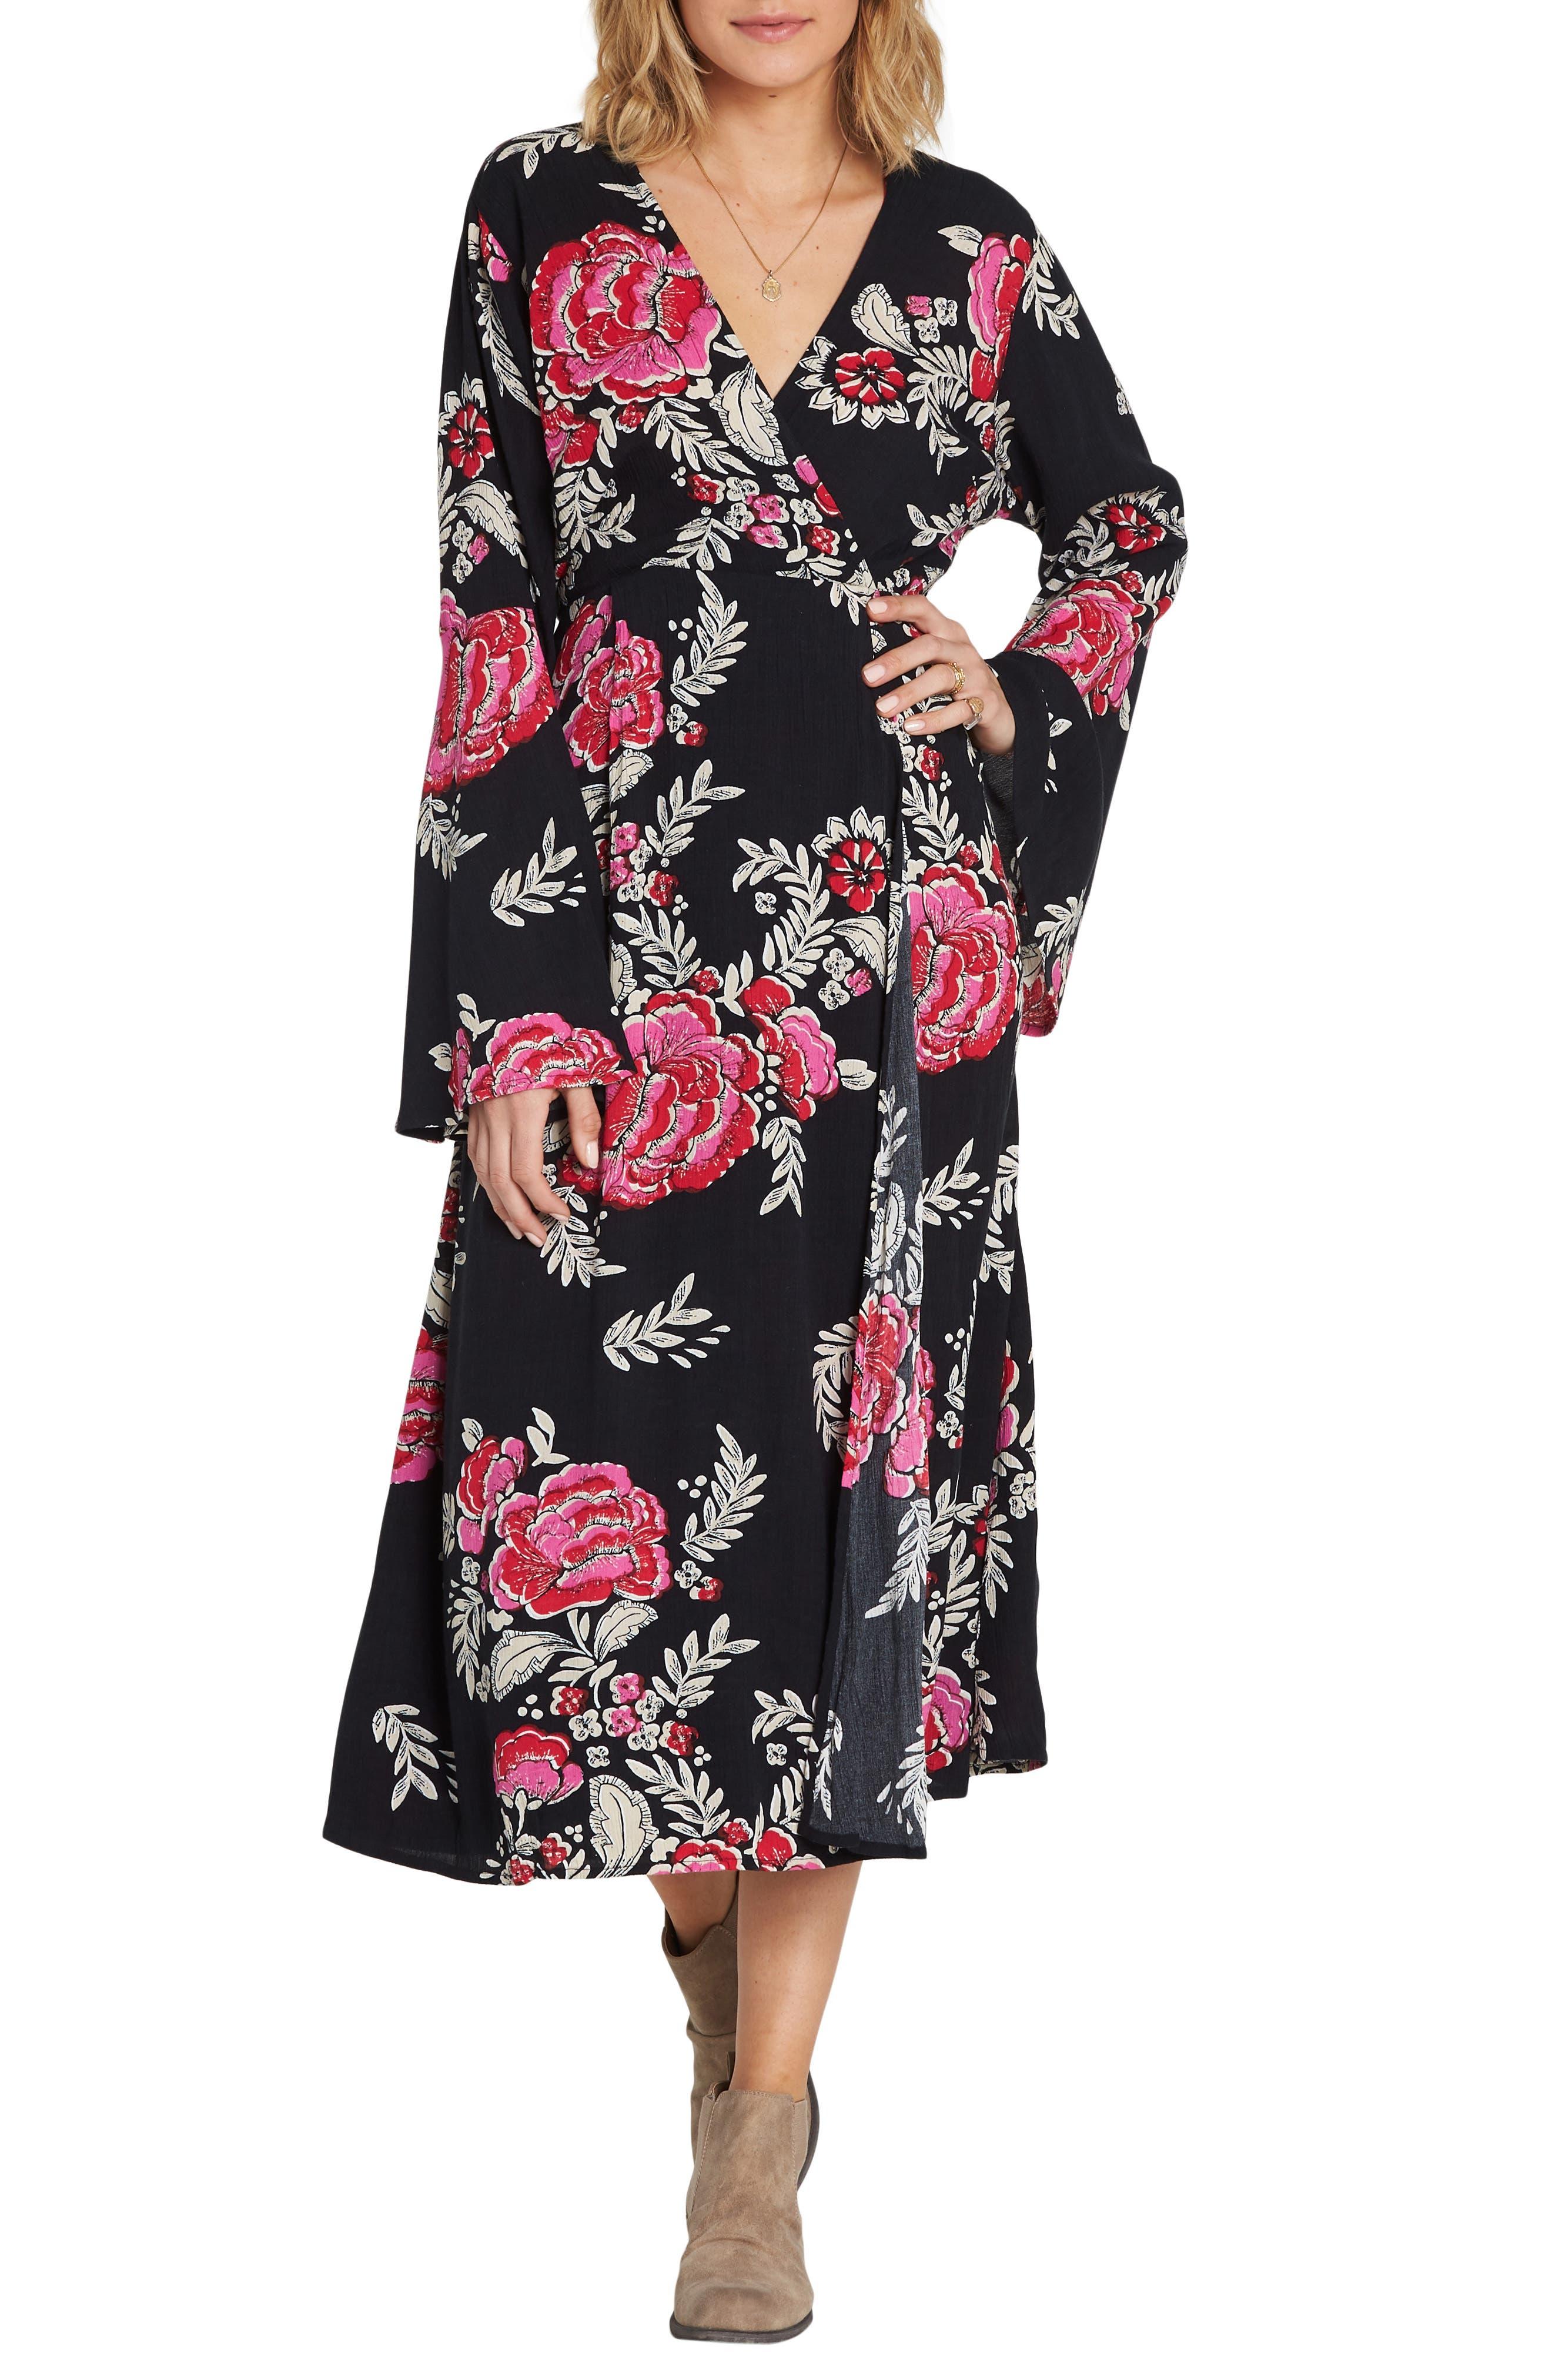 Floral Whispers Floral Midi Dress,                         Main,                         color, BLACK